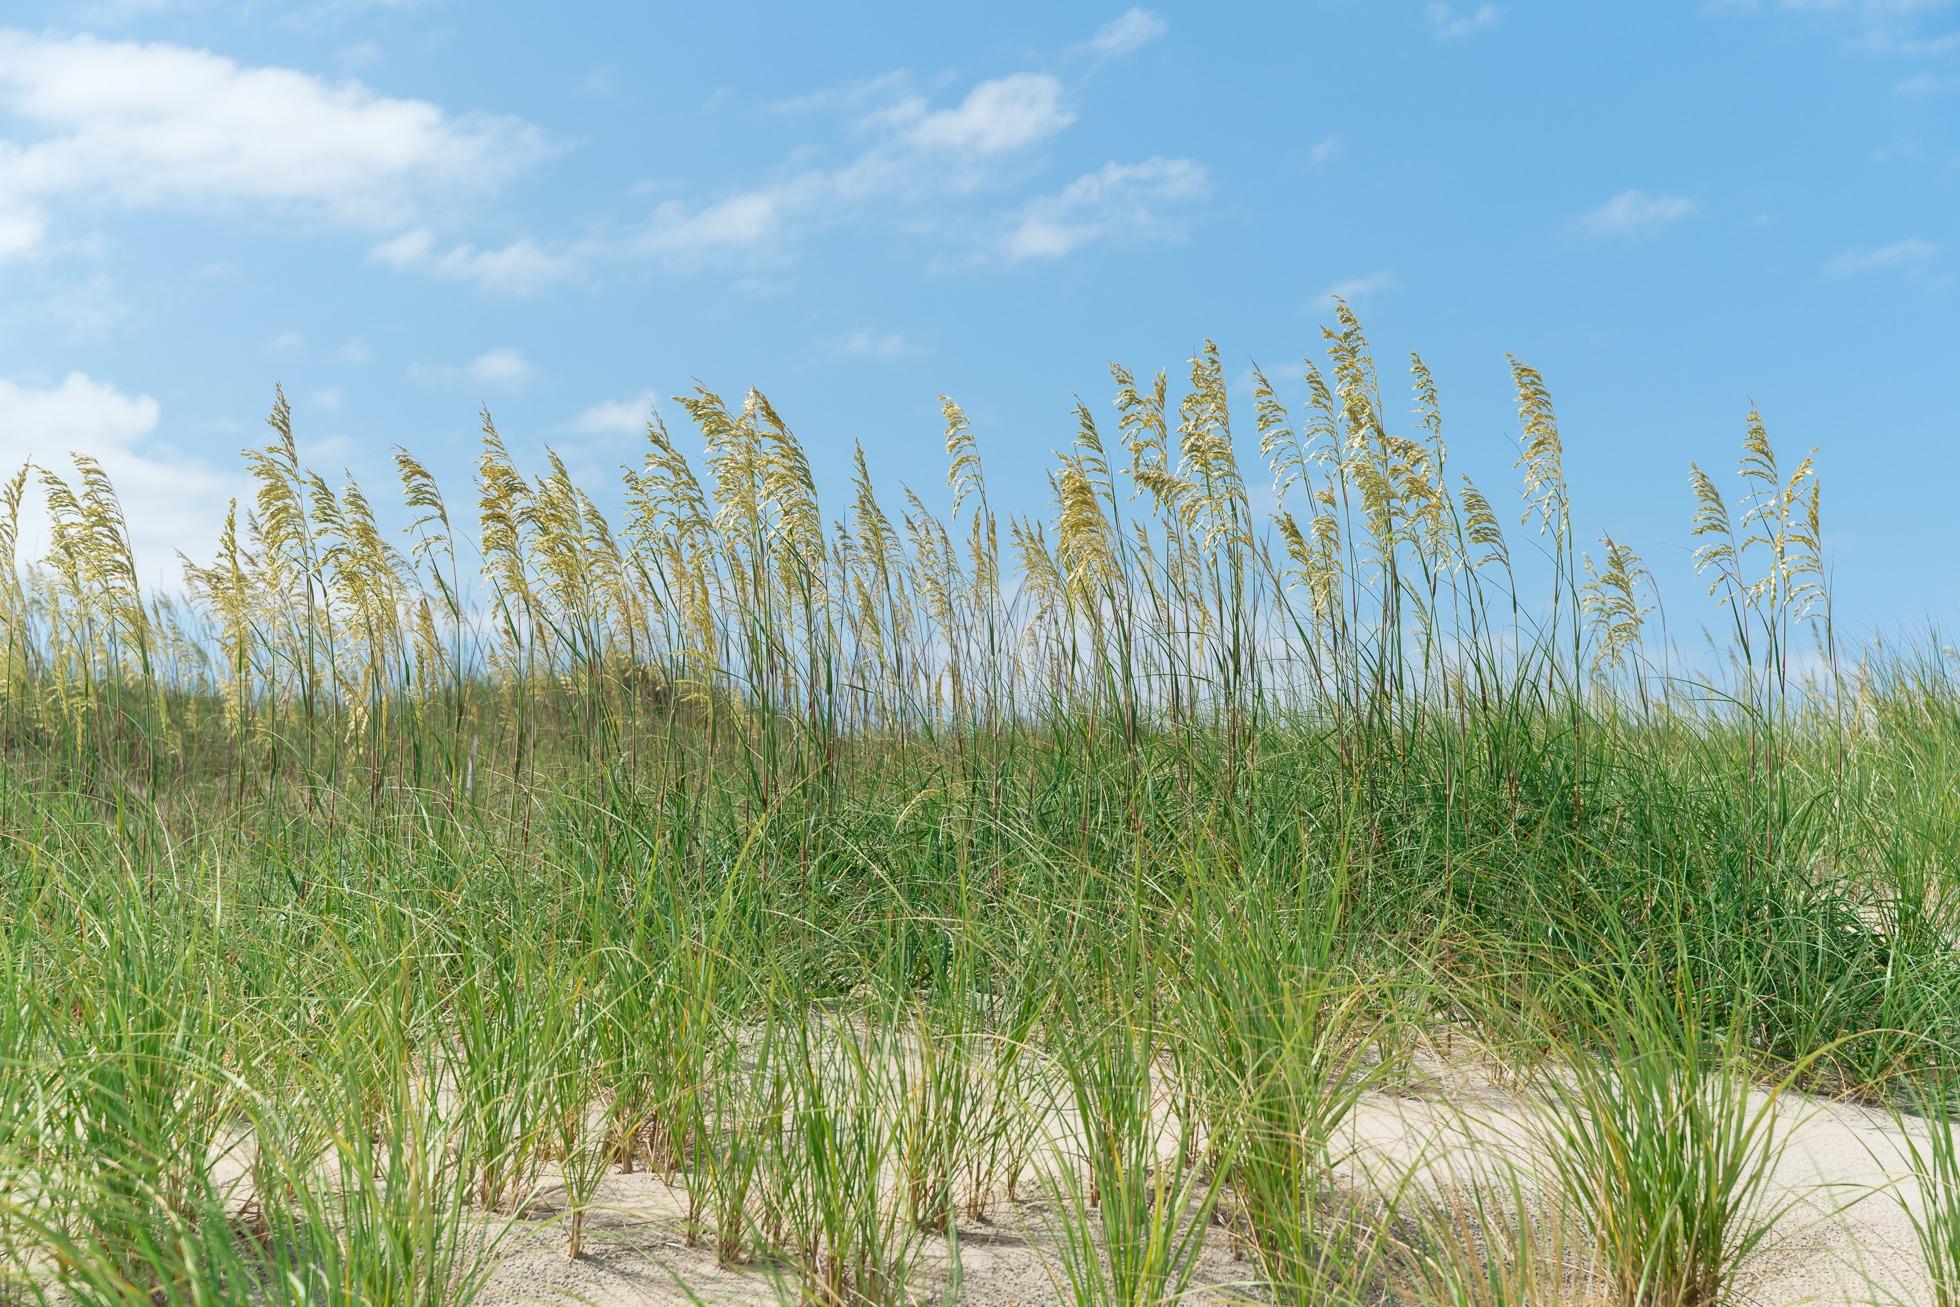 frisco sand dunes, cape hatteras, outer banks